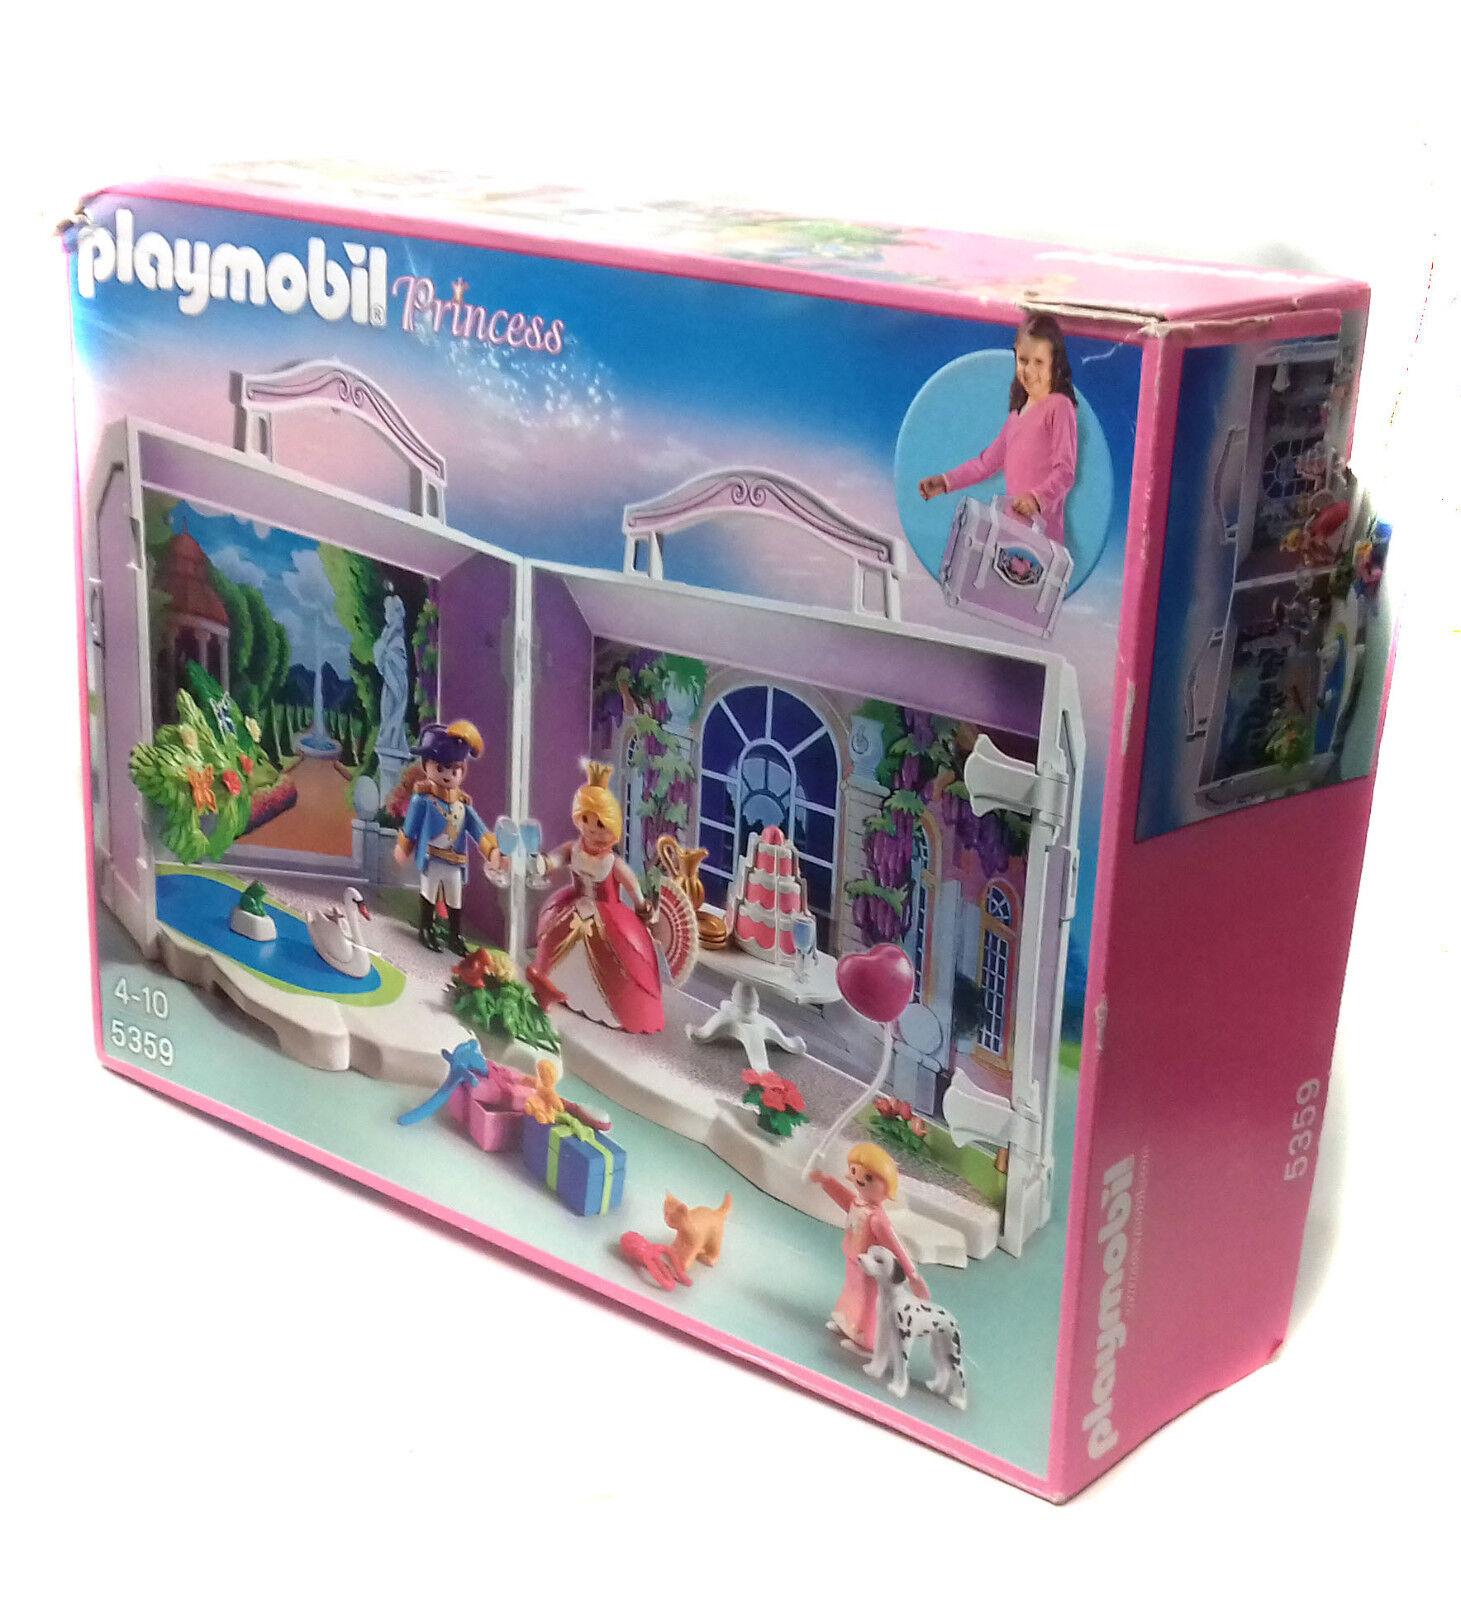 Playmobil 5359 Princess TAKE ALONG BIRTHDAY Opening Playset toy figures & box